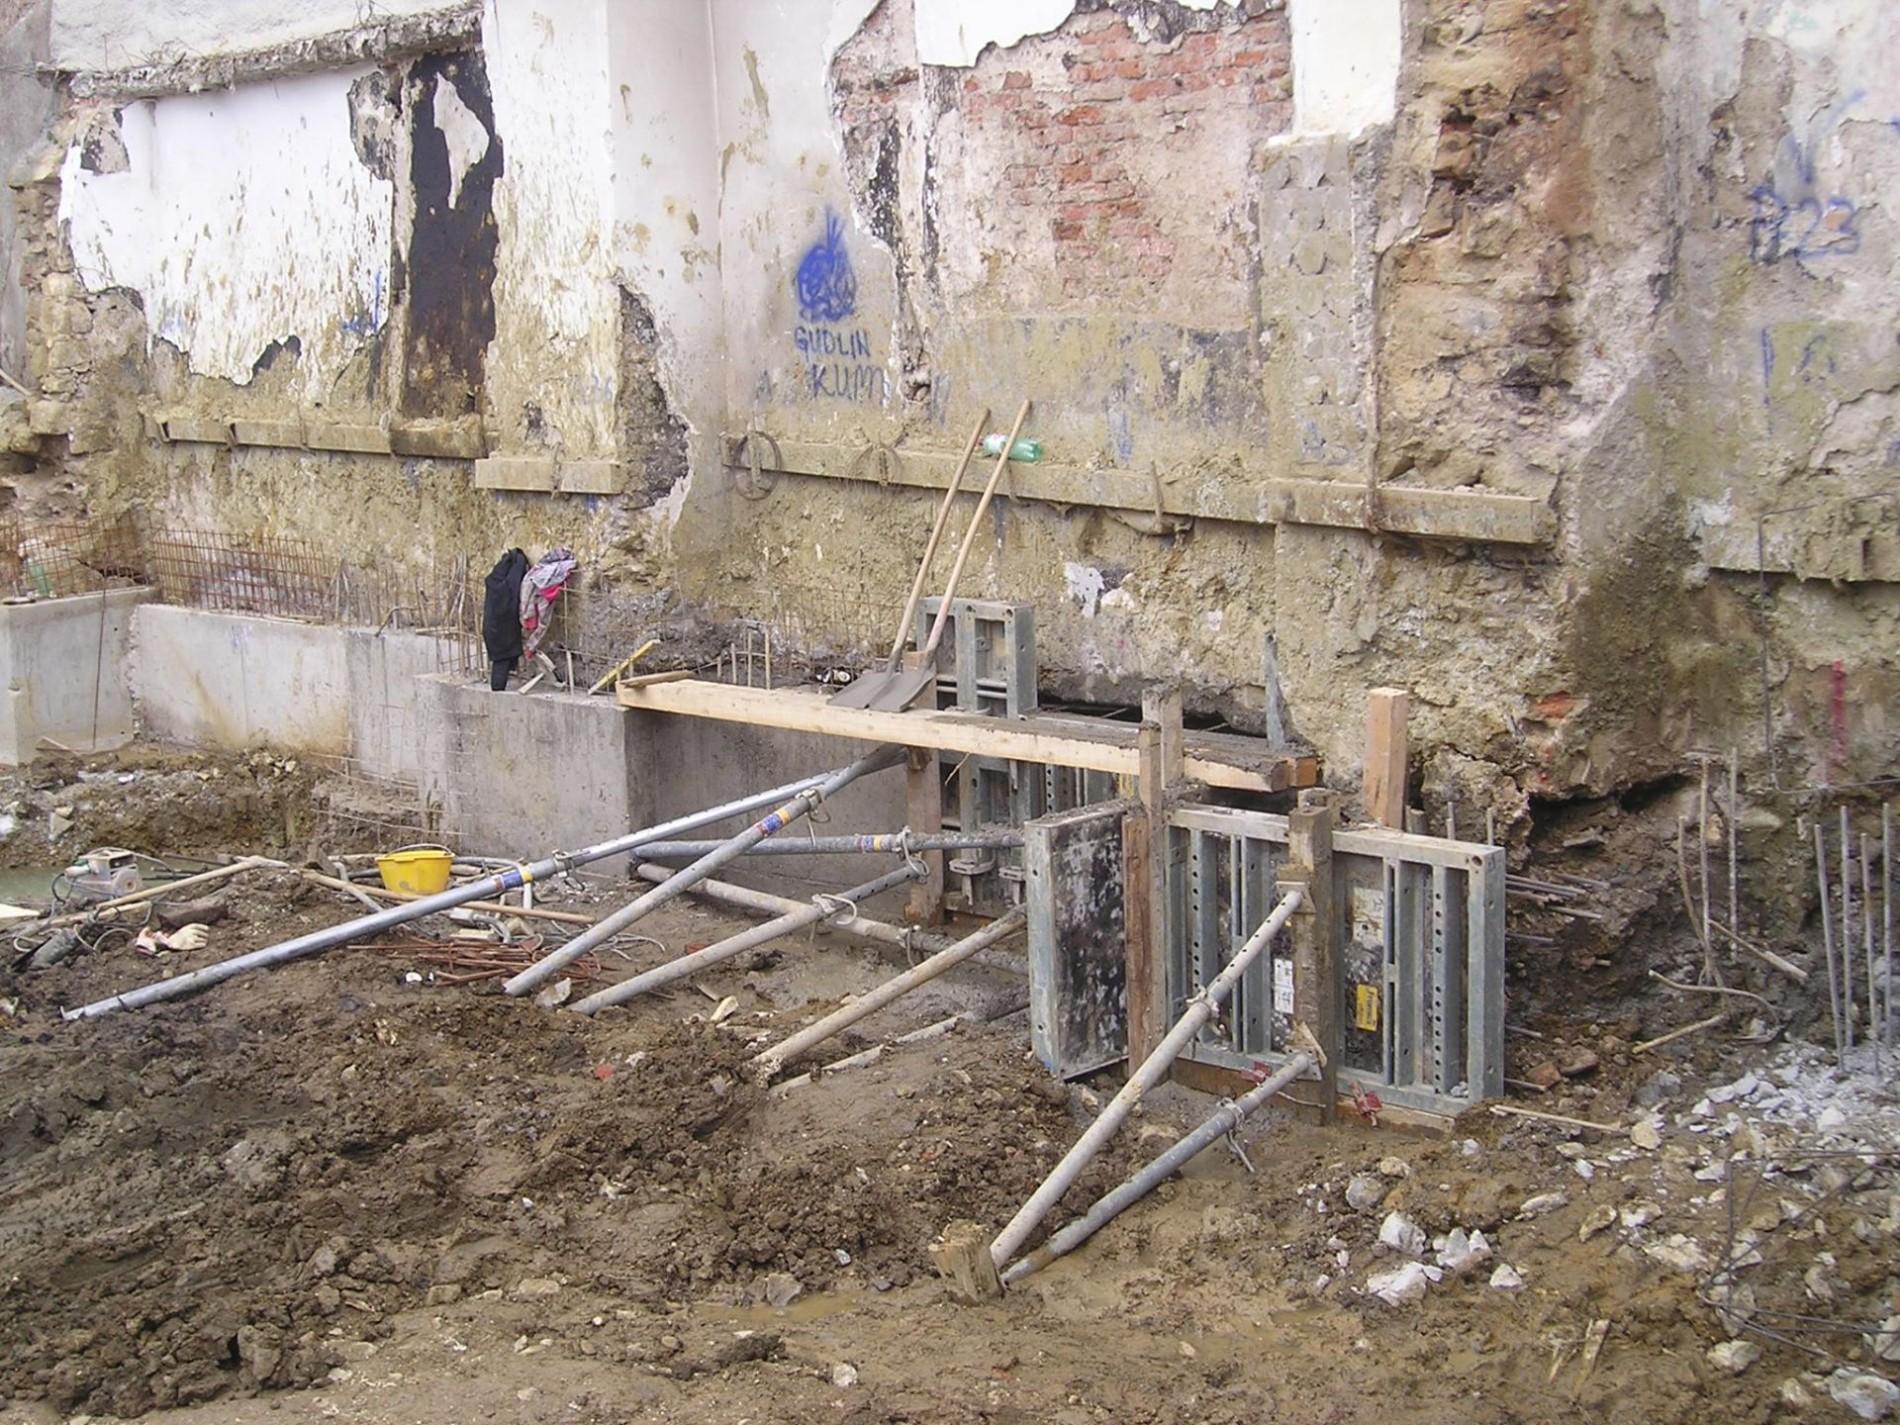 vlaška, stara vlaška, vlaška 9, beton, vlaska, concrete, structure, konstrukcija, rekonstrukcija, reconstruction, nikola filipović, nikola filipovic, upi-2m, upi-2m d.o.o.